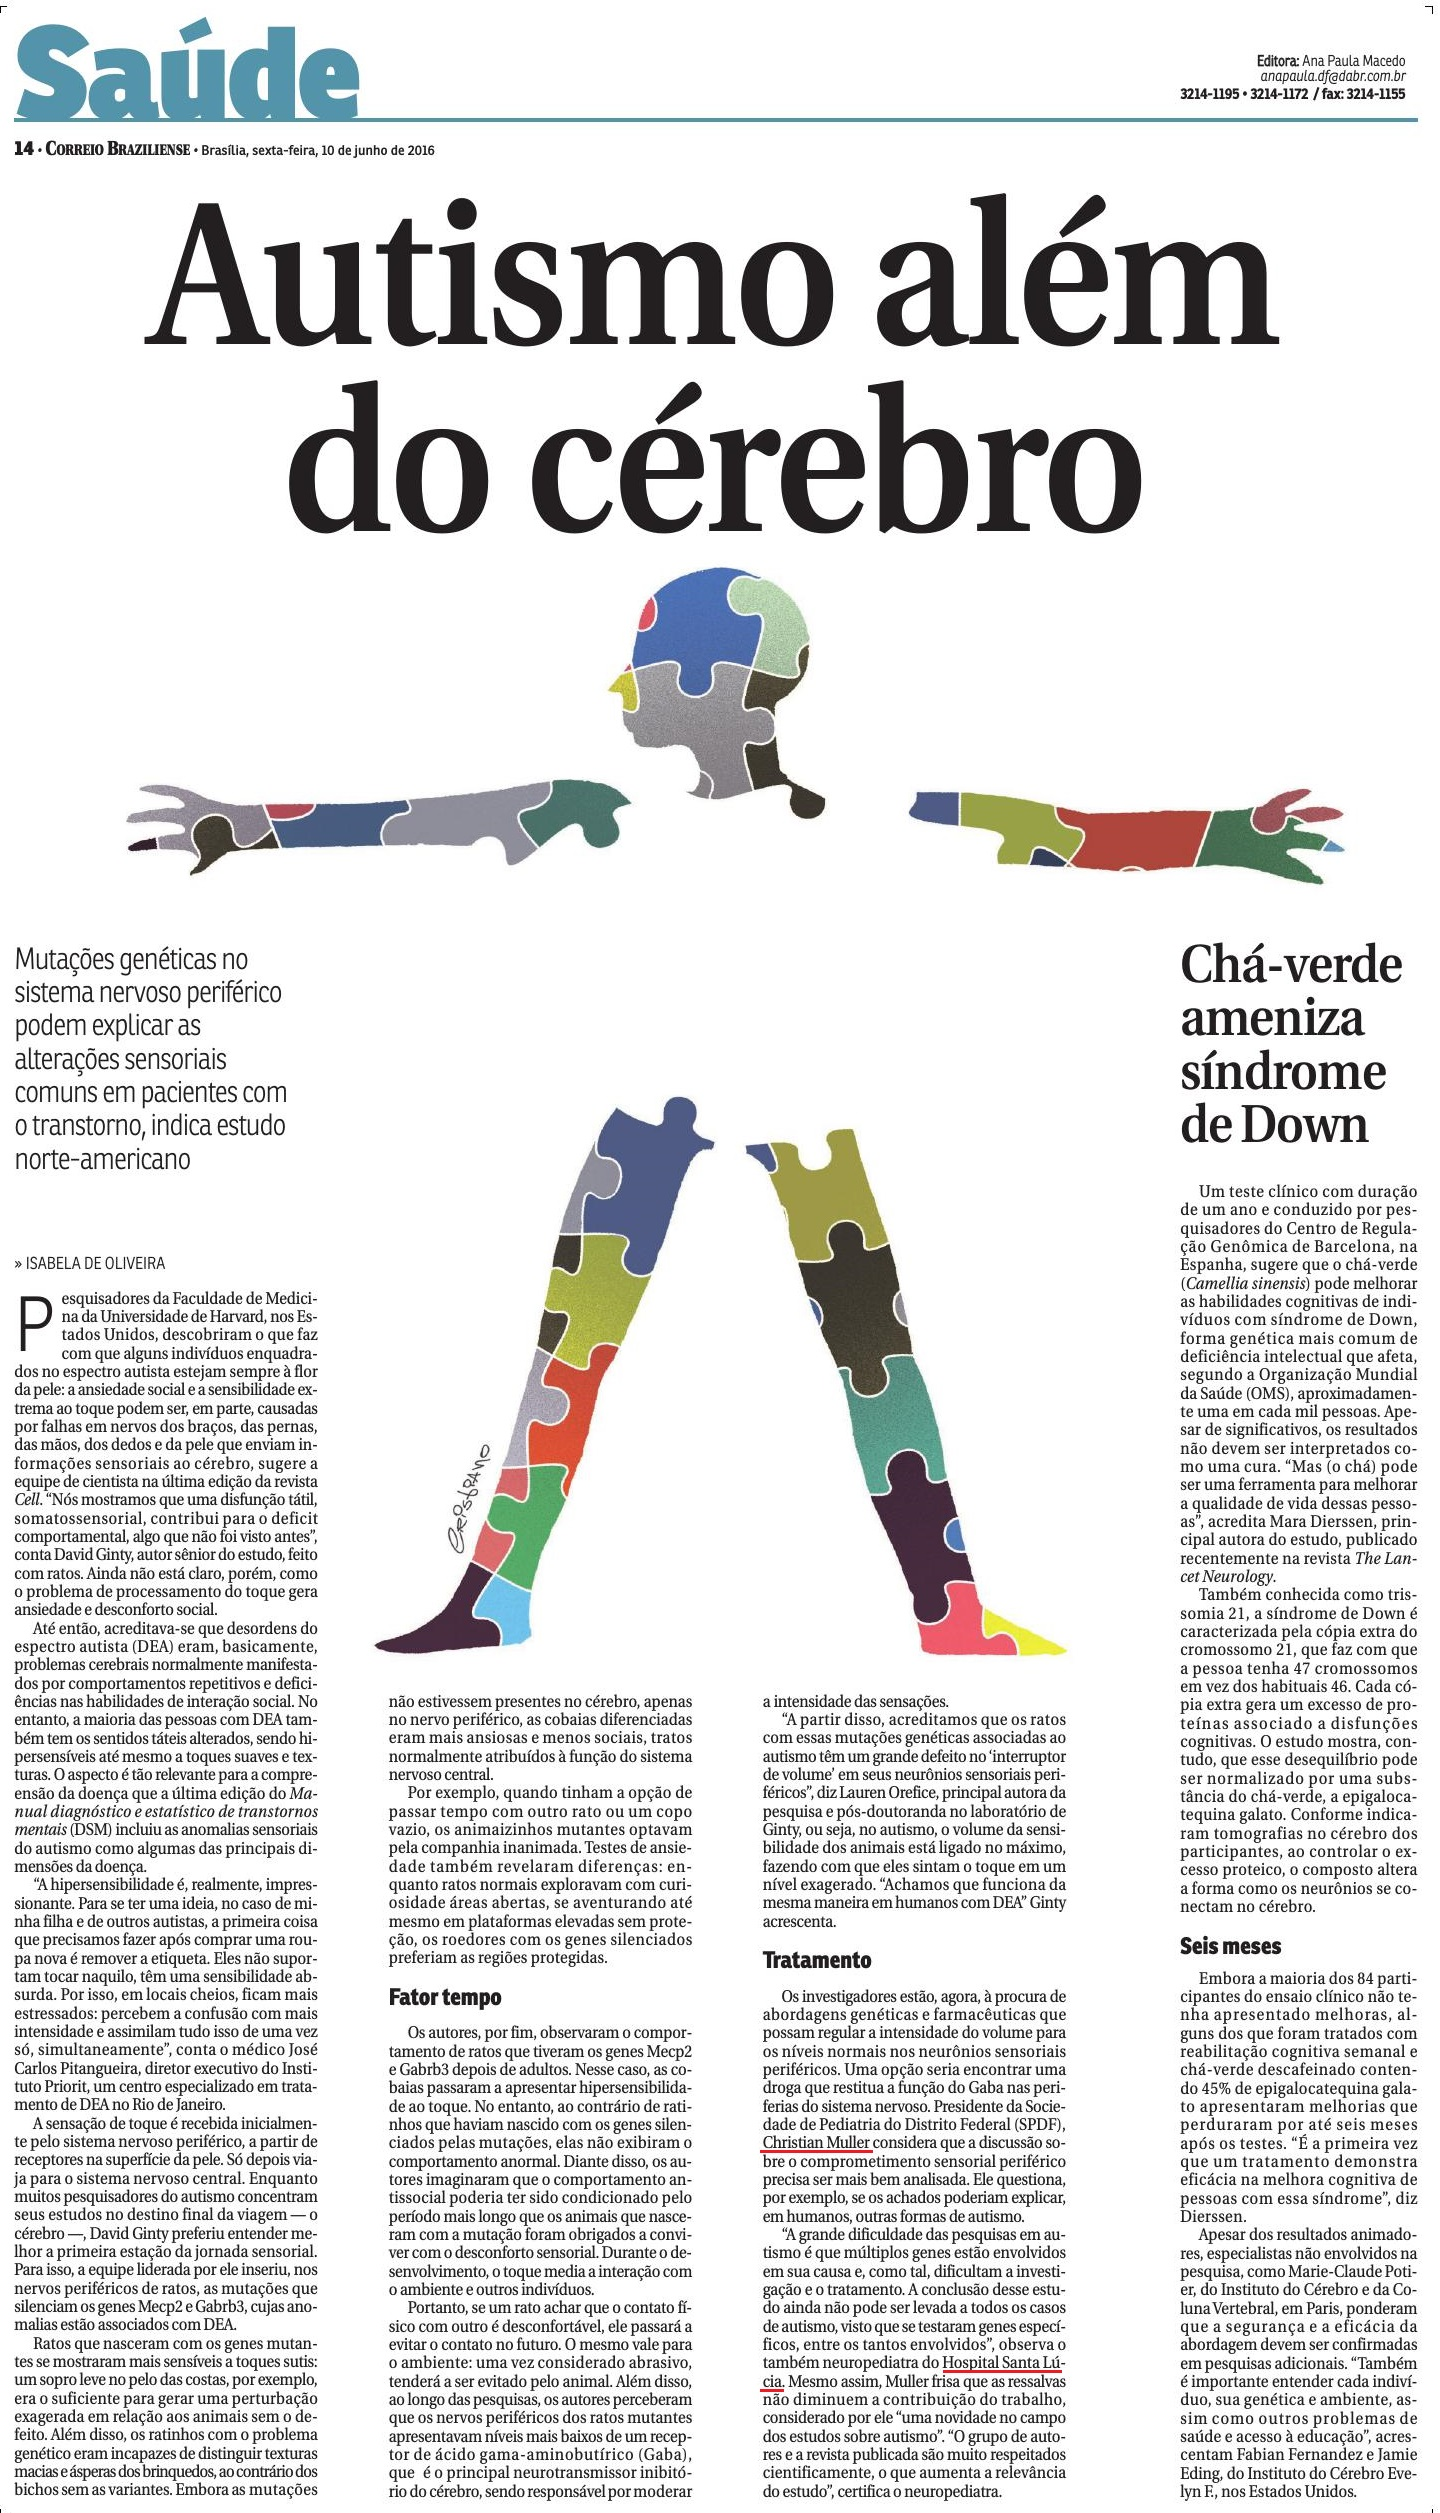 Correio Braziliense - Autismo além do cérebro - HSL - 10-06-2016